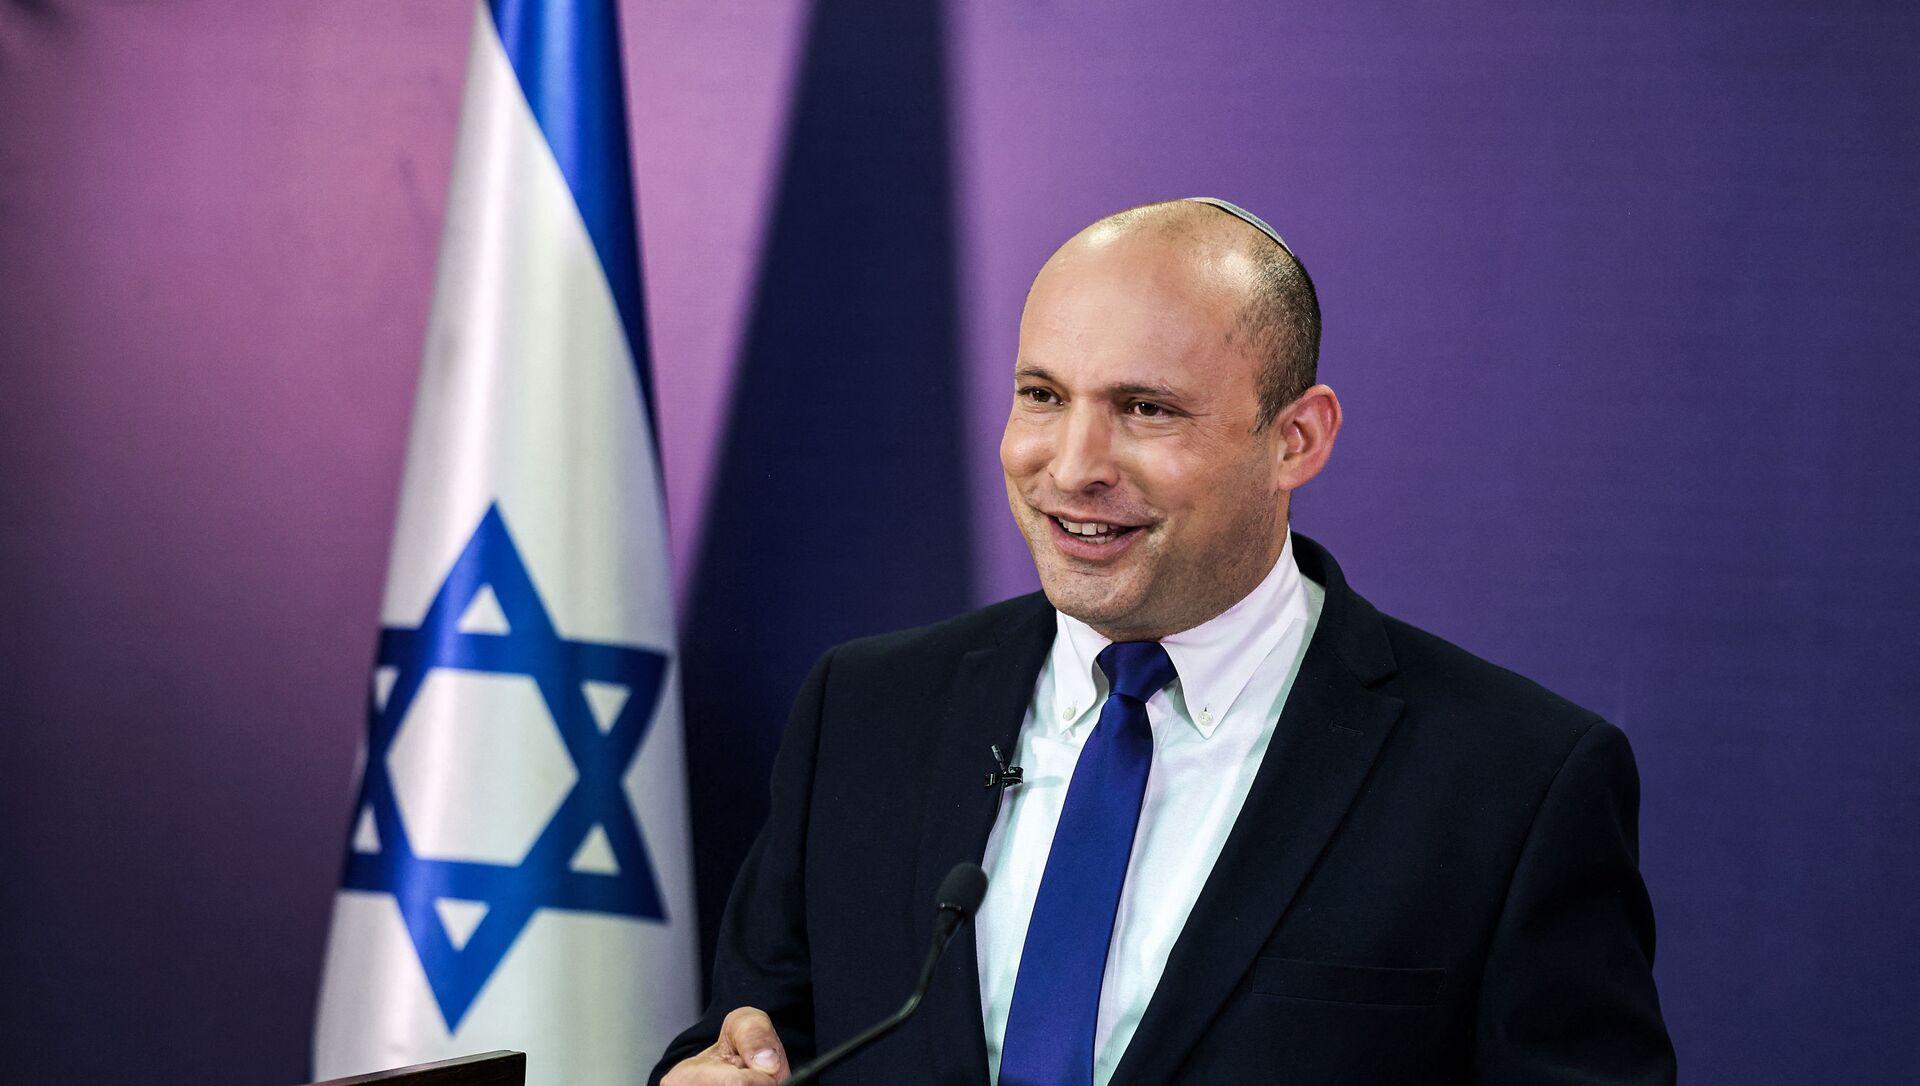 Naftali Bennett Becomes Israel's New Prime Minister, Ending Netanyahu's 12-Year Tenure - Sputnik International, 1920, 13.06.2021